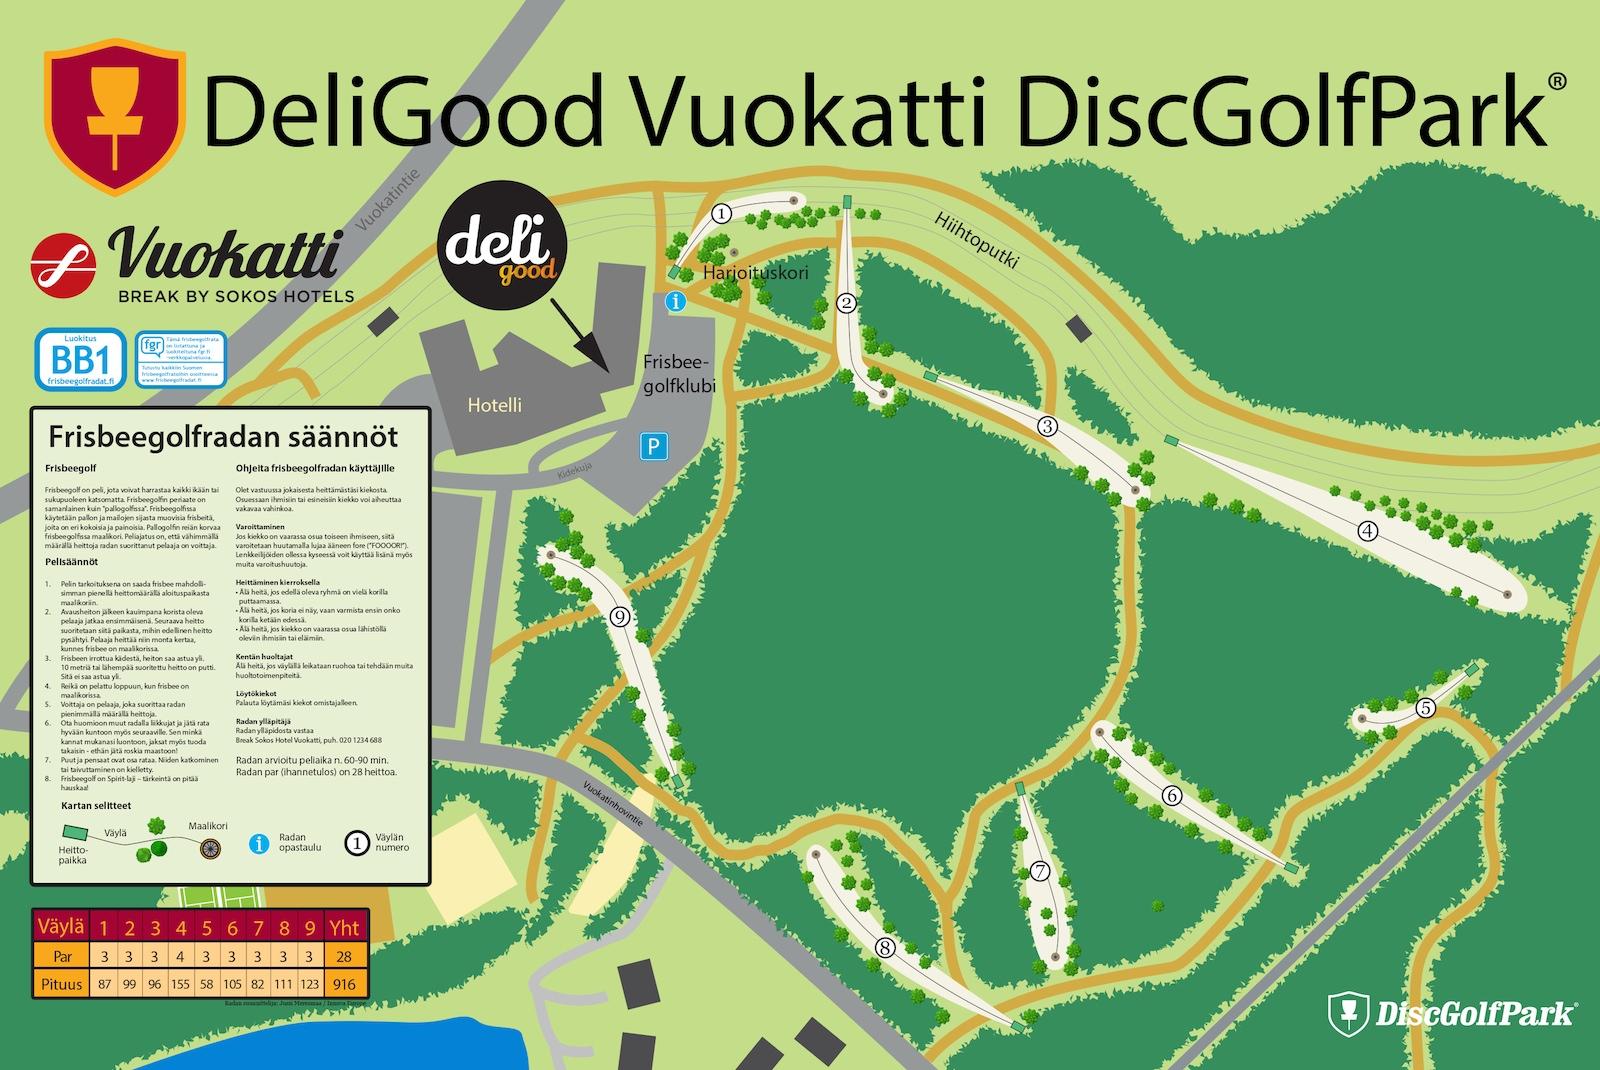 Deligood Vuokatti Discgolfpark Discgolfpark